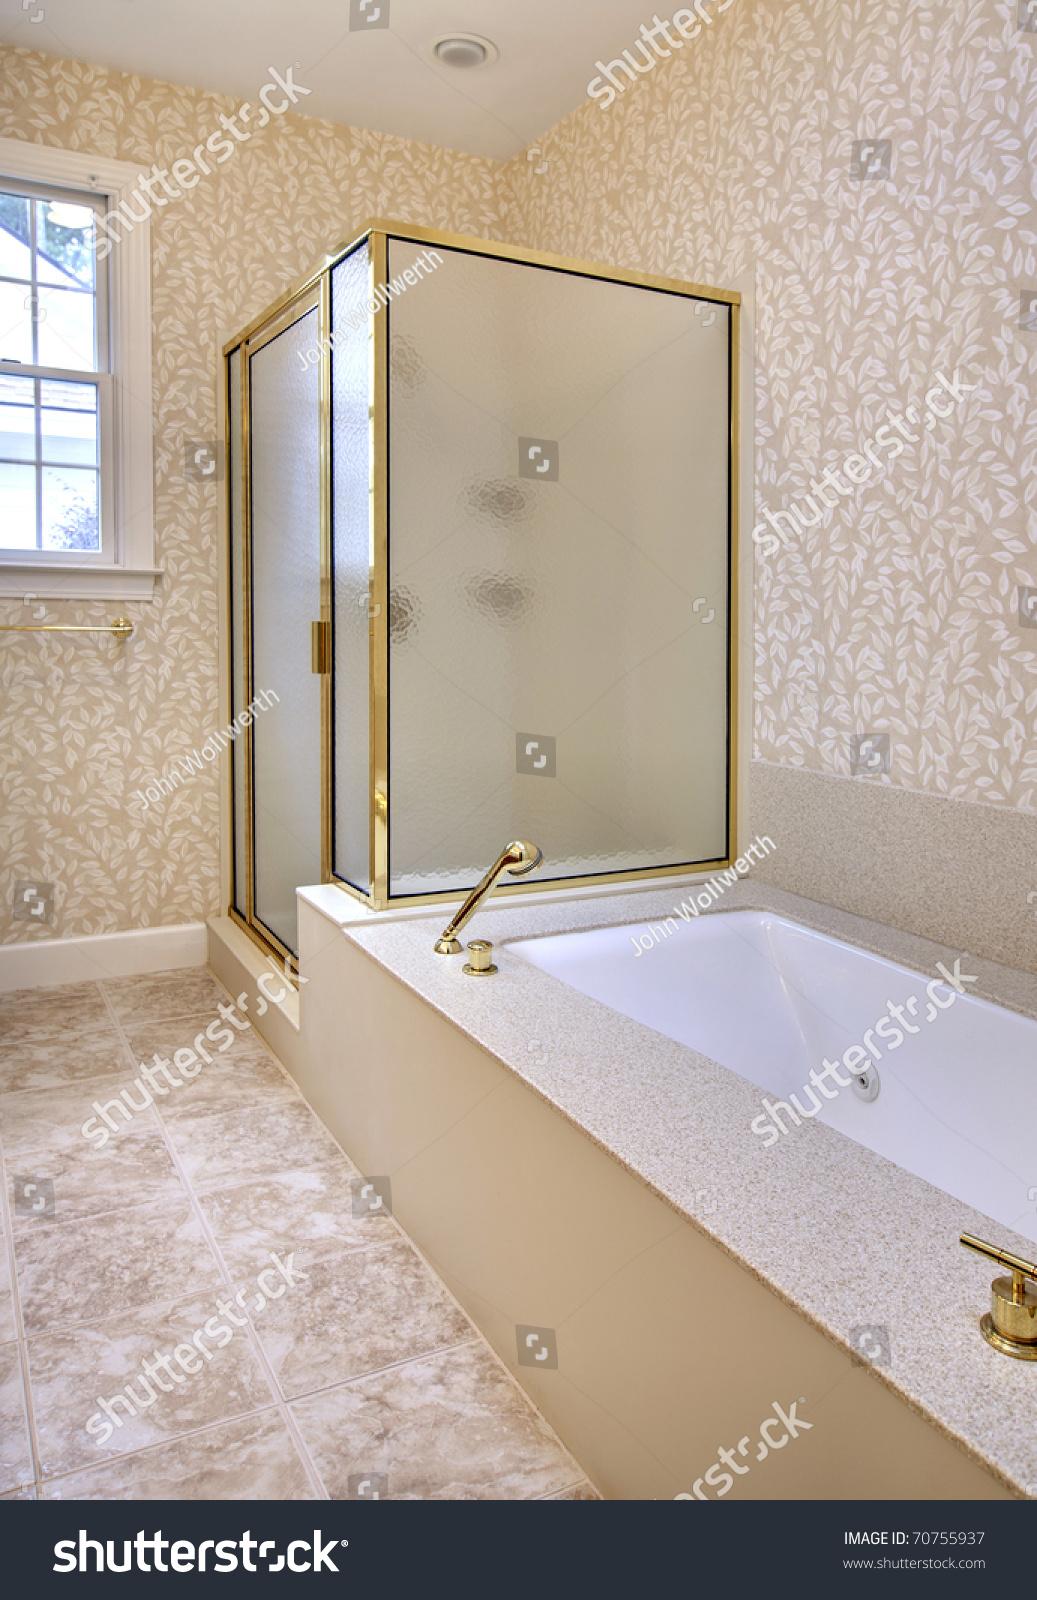 Master Bathroom Ideas With Jacuzzi Tub